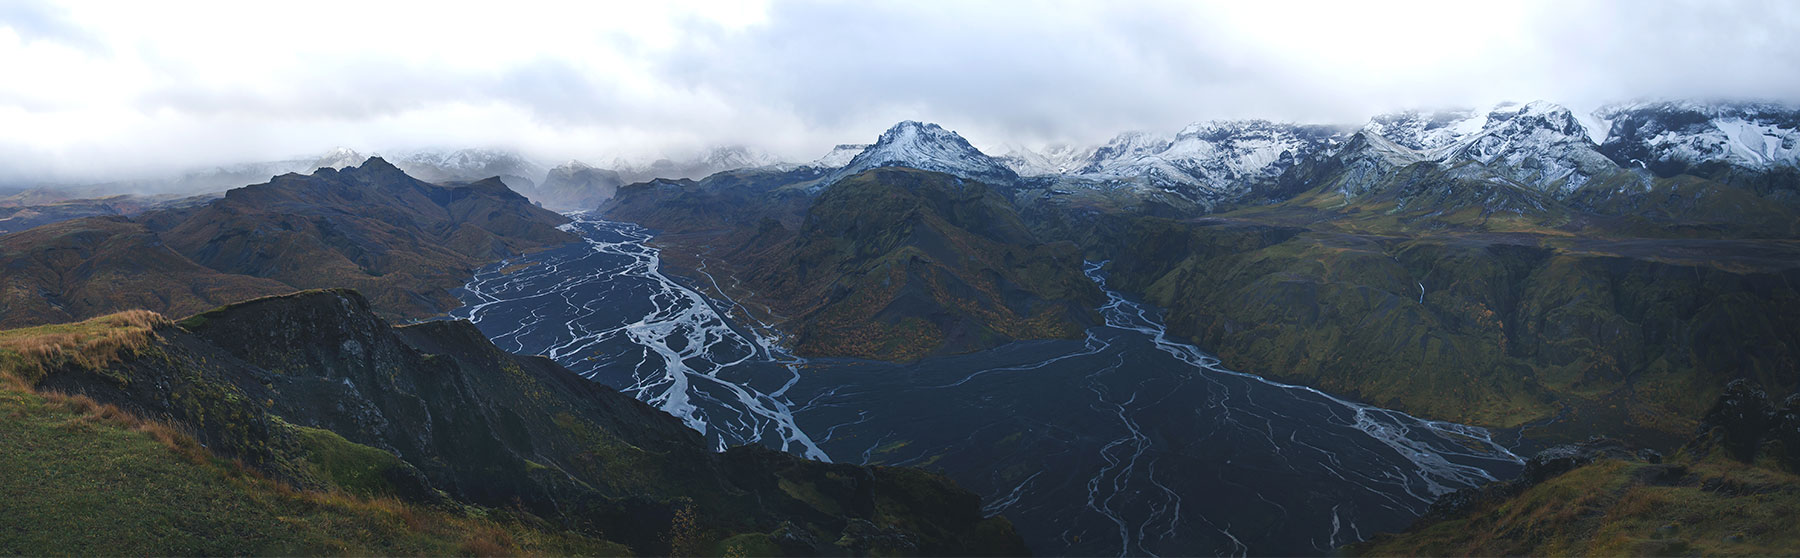 RUNAWAYS - 5 DAYS IN ICELAND.  wIN THIS tRIP  .